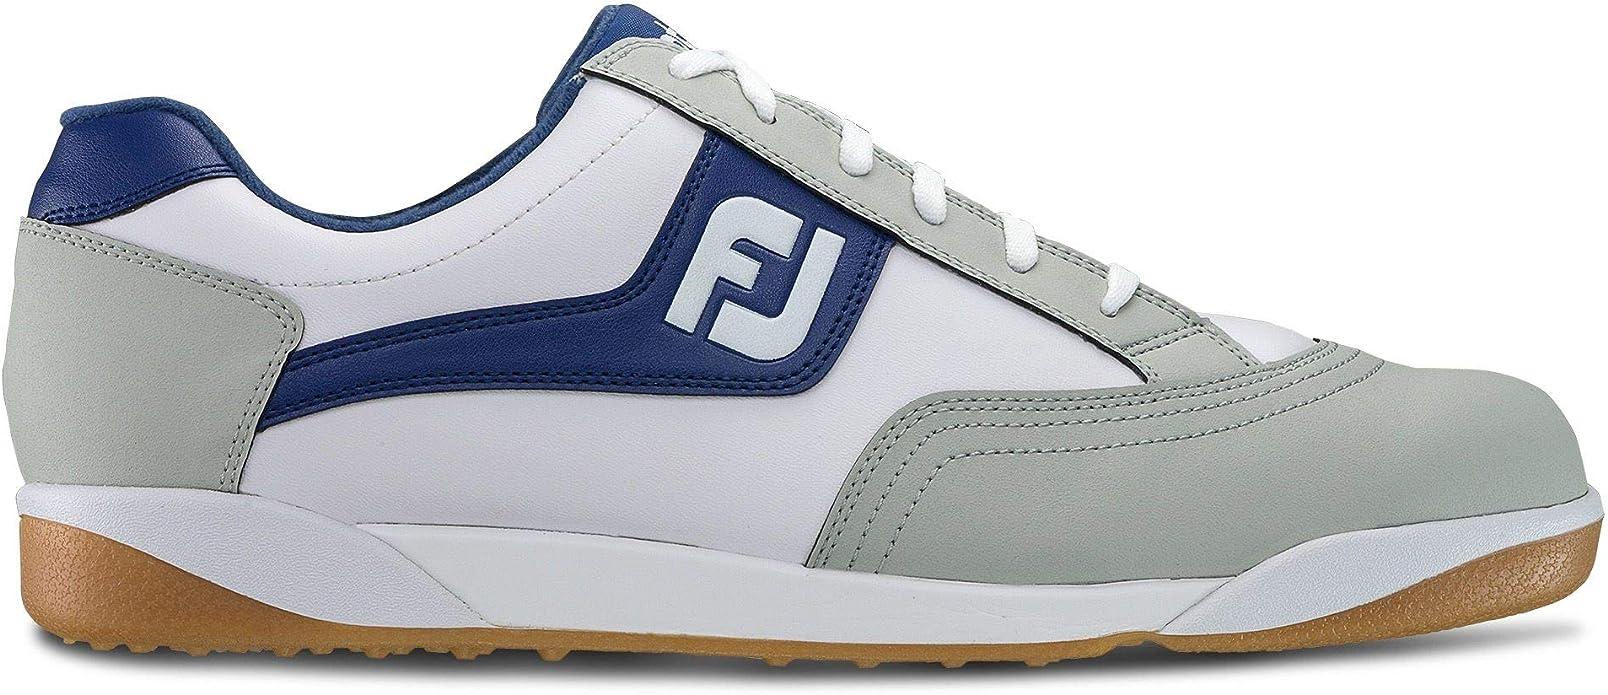 Amazon.com   FootJoy Men's Fj Originals-Previous Season Style Golf Shoes    Golf